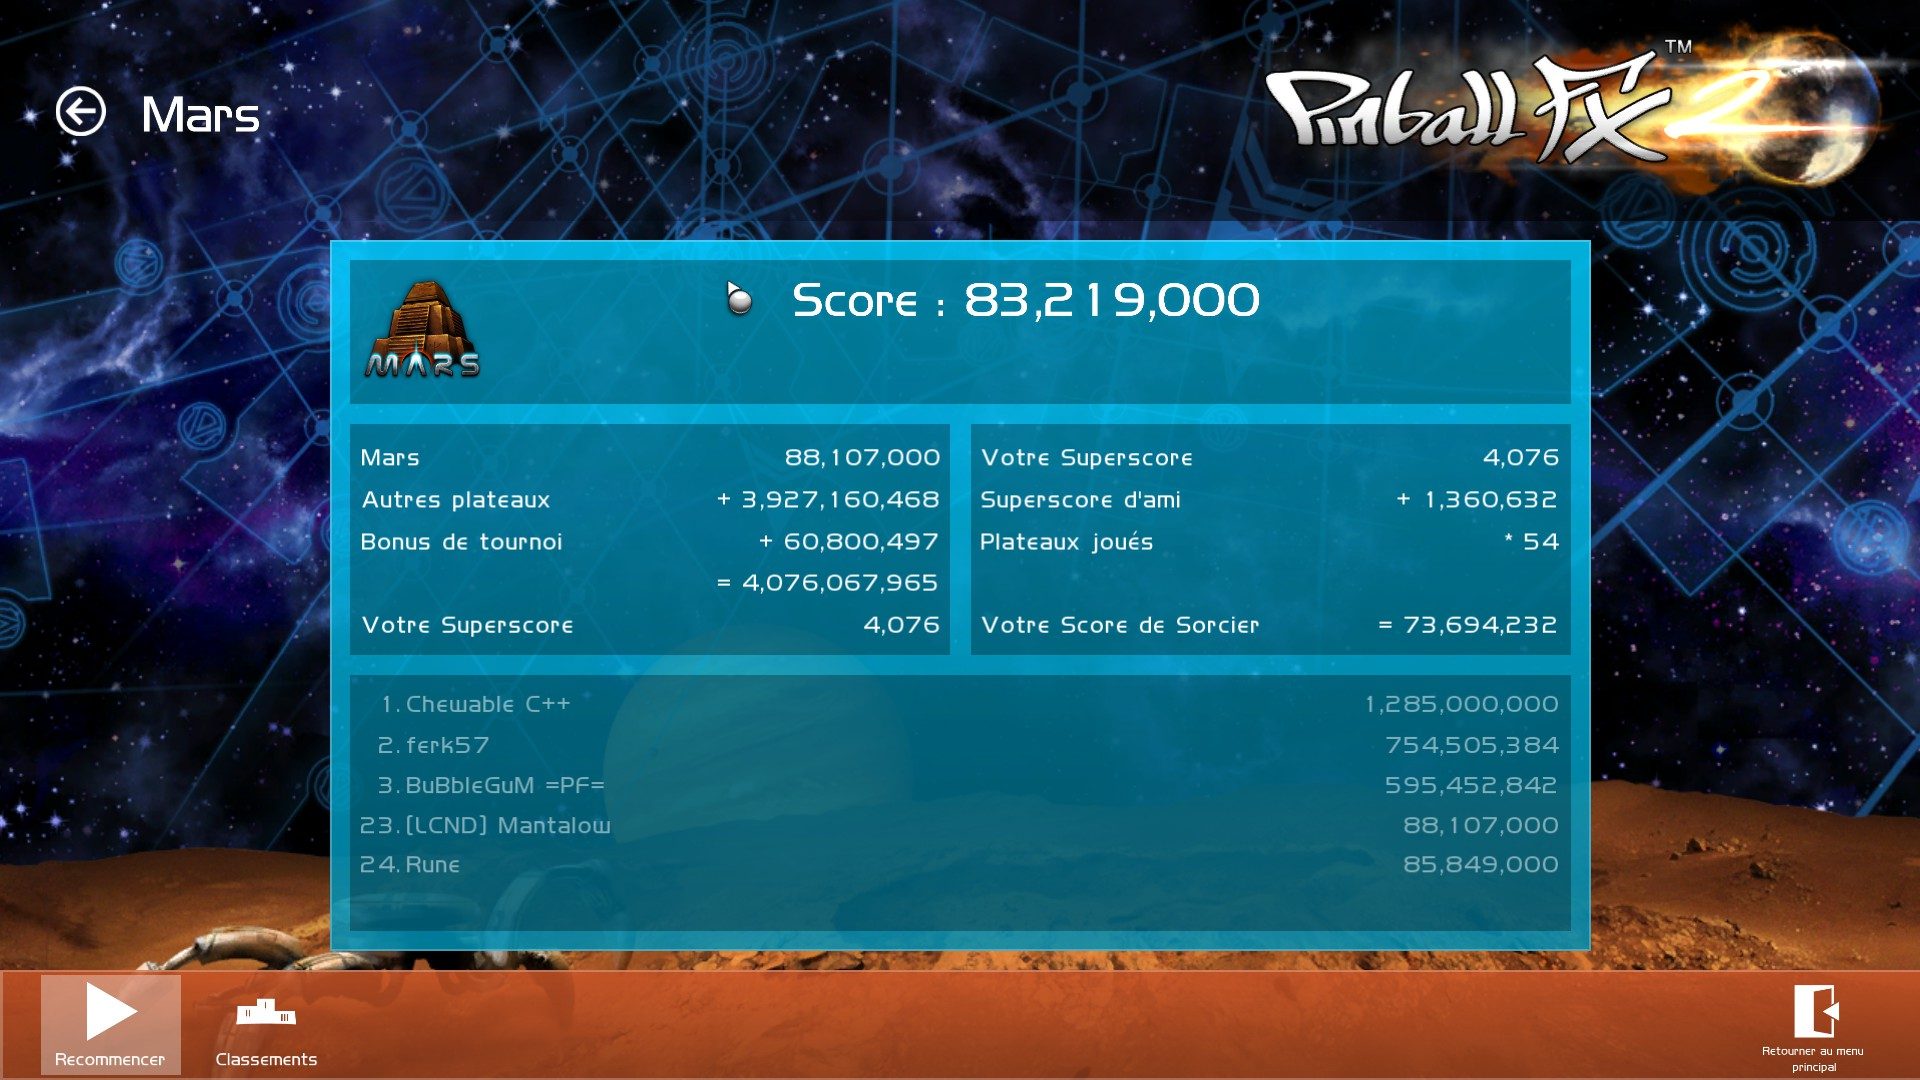 Mantalow: Pinball FX 2: Mars (PC) 88,107,000 points on 2015-07-21 11:25:17